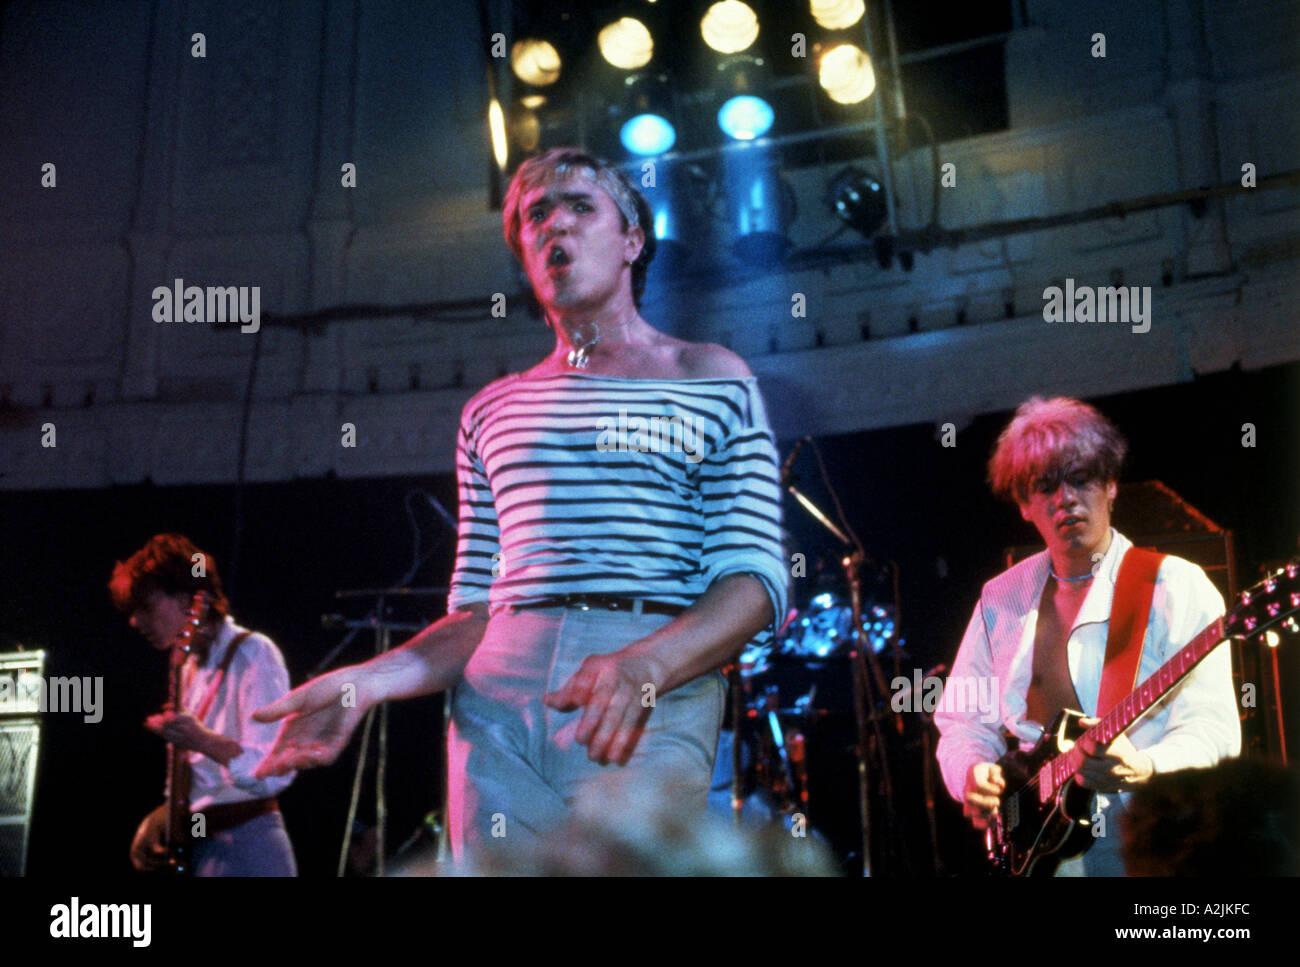 Banda de pop británico Duran Duran en los 80s con Simon Le Bon como cantante principal Imagen De Stock